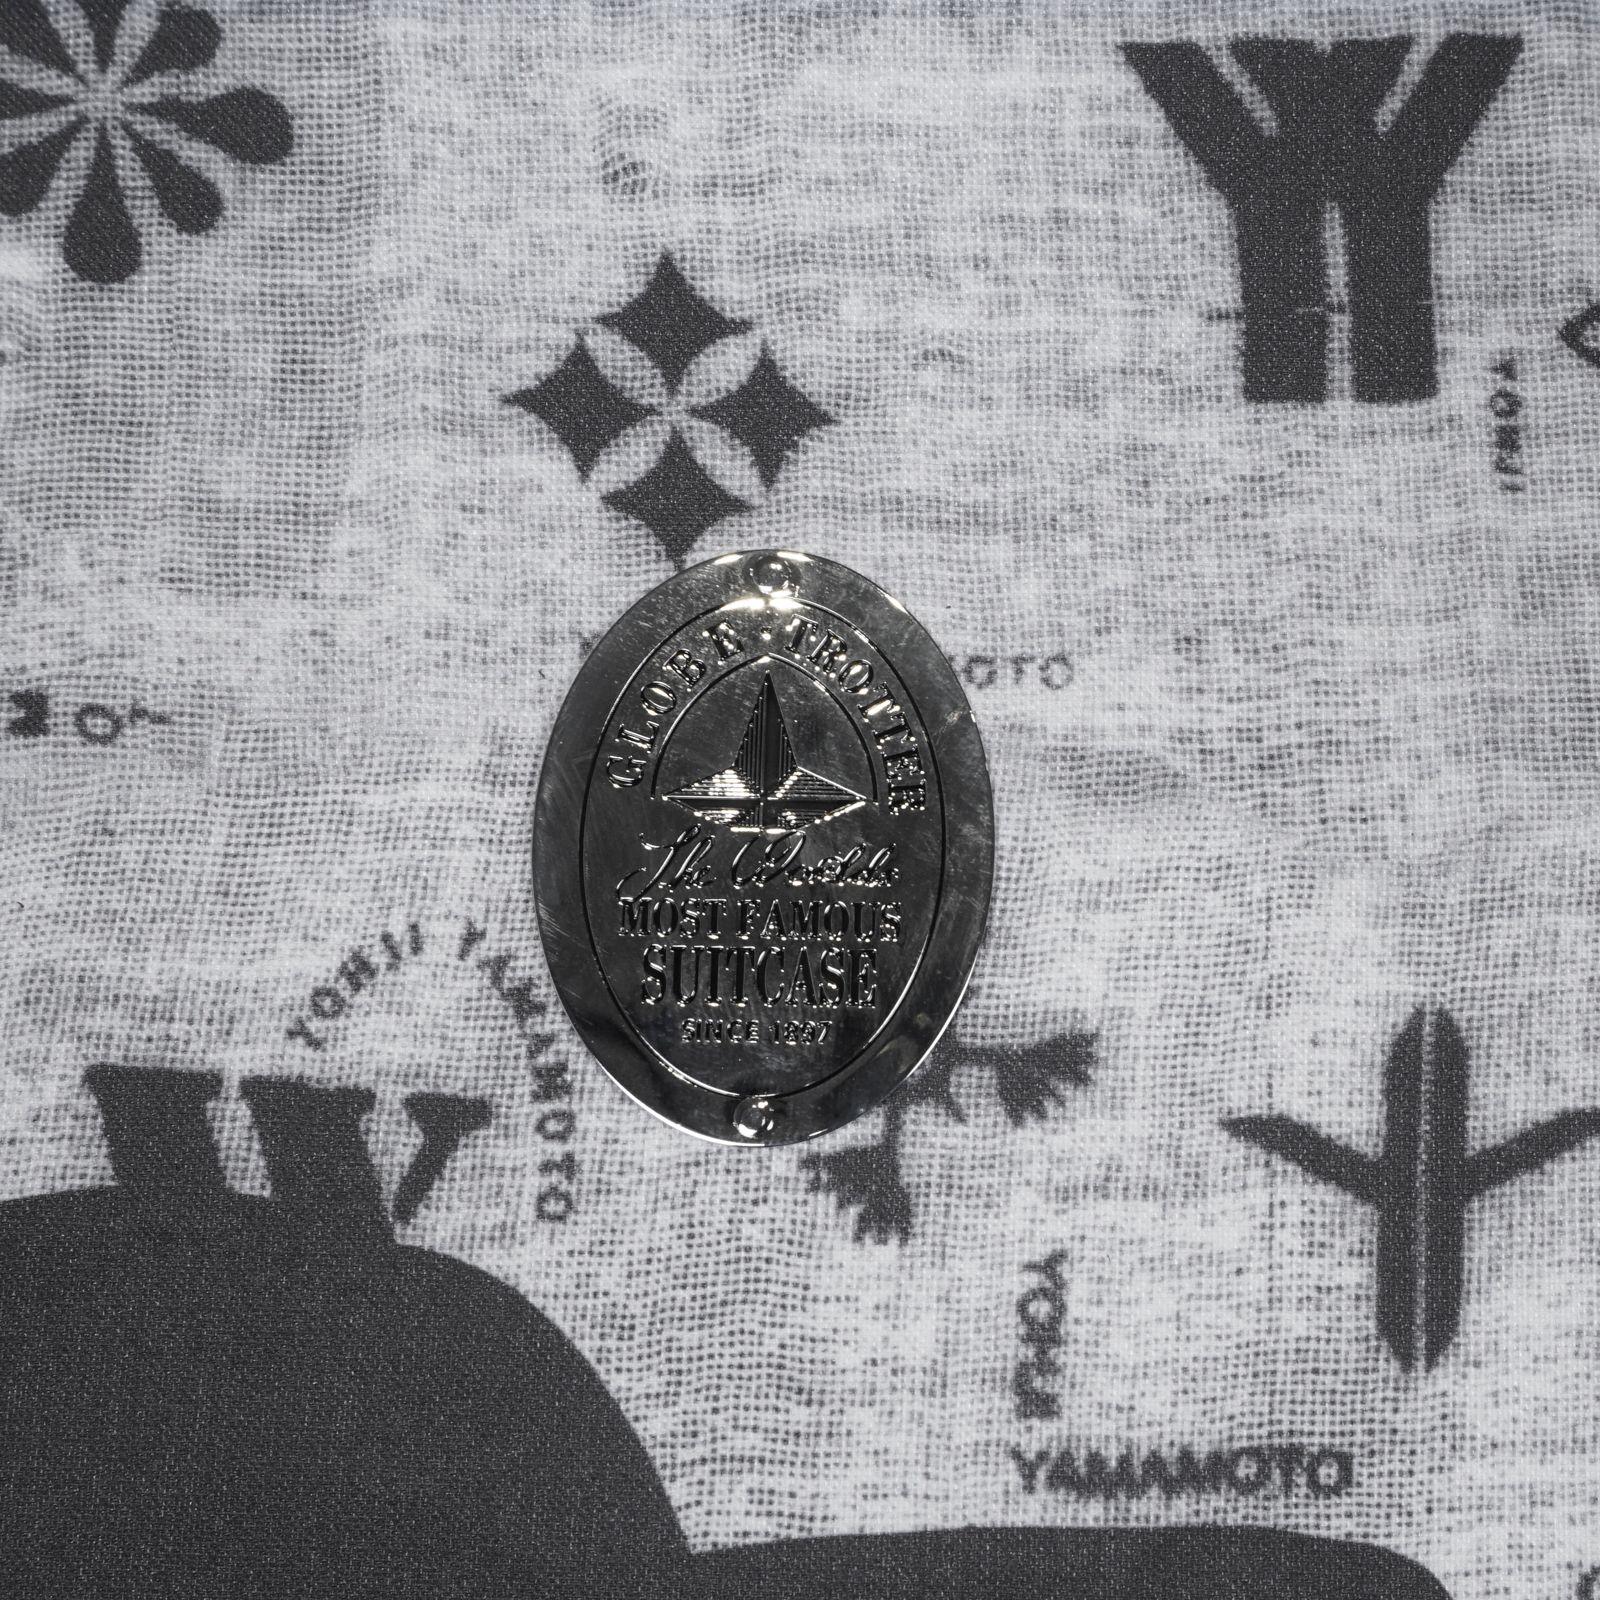 discord - discord | yohji yamamoto [DH-I15-902 / 20インチ トロリーケース